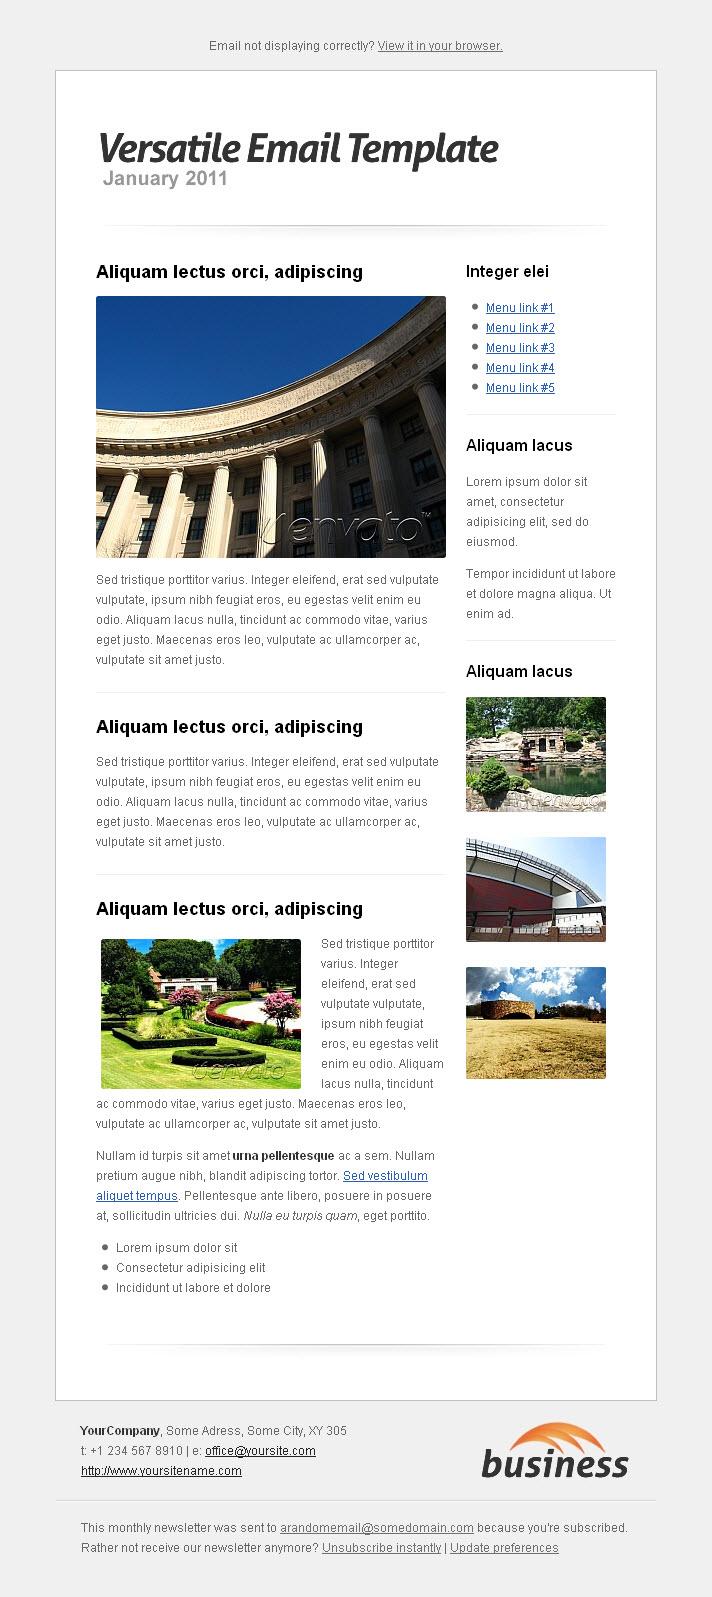 http://2.s3.envato.com/files/1523716/2_versatile-layout-1.jpg